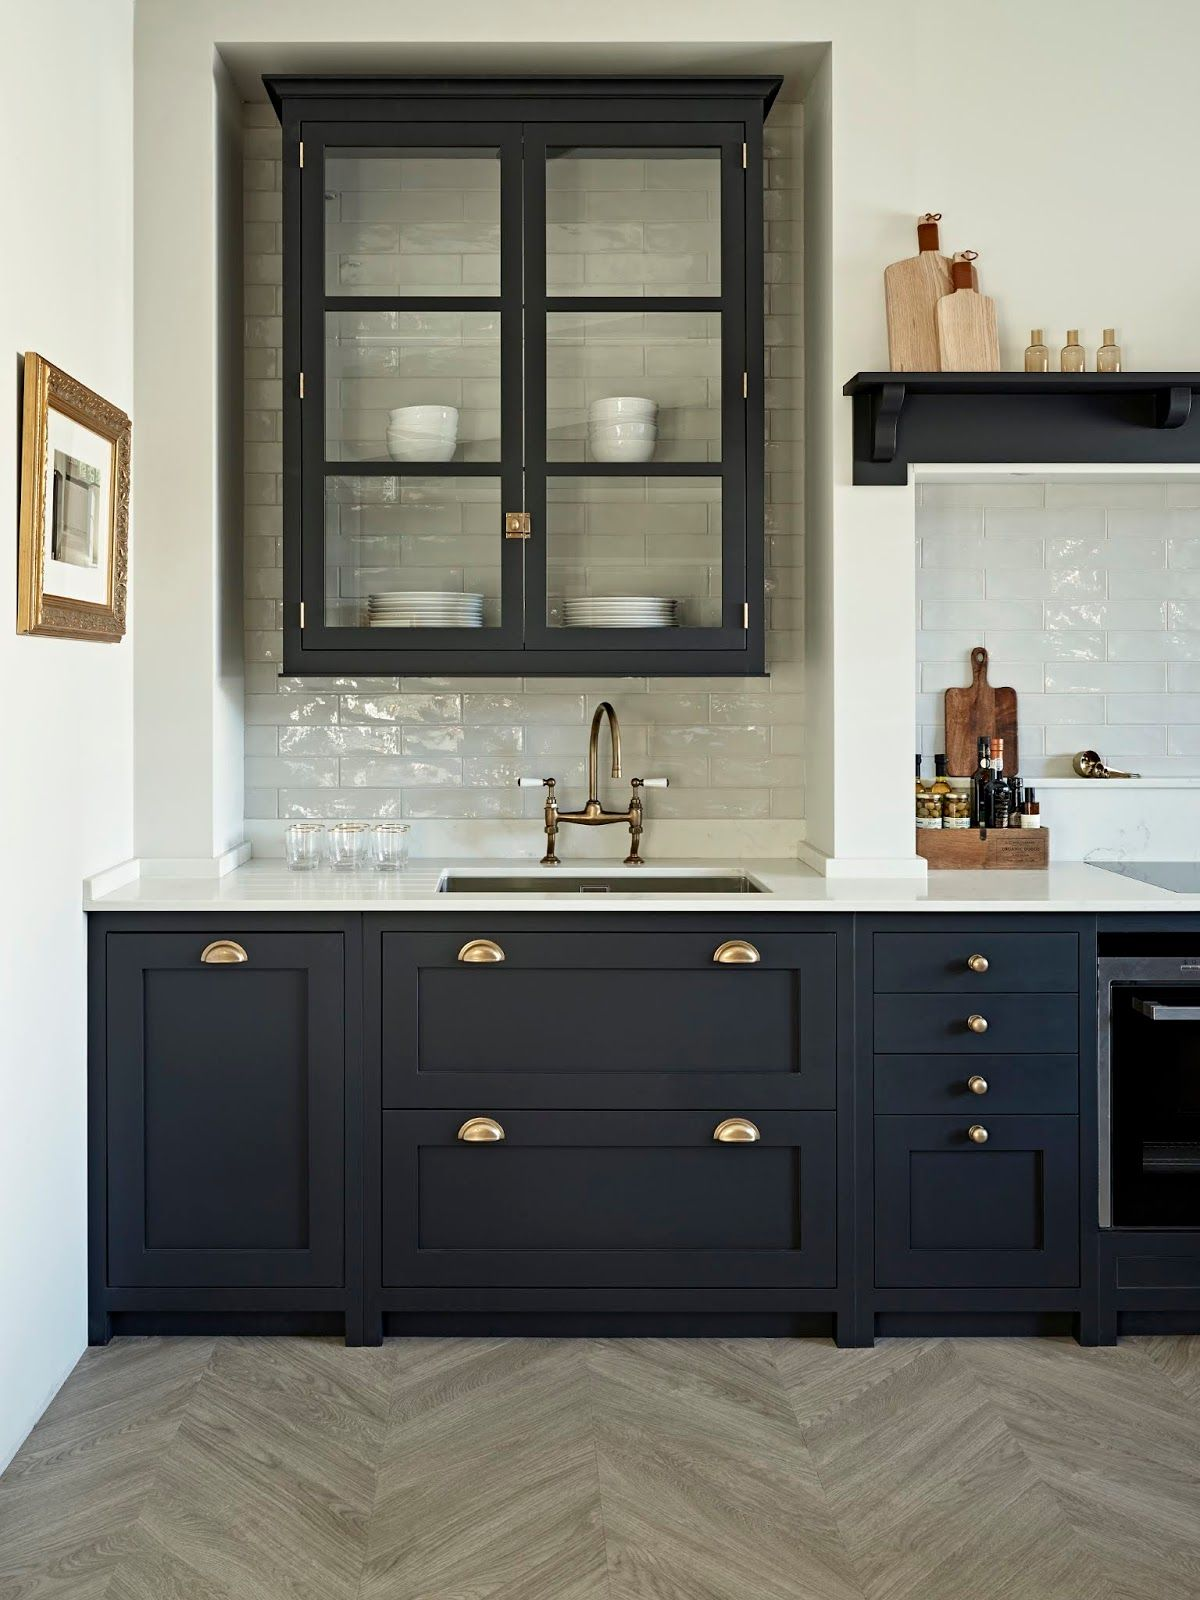 Simple Kitchen Ideas Contemporary Kitchen Remodel Design Modern Kitchen Design Kitchen Cabinet Design